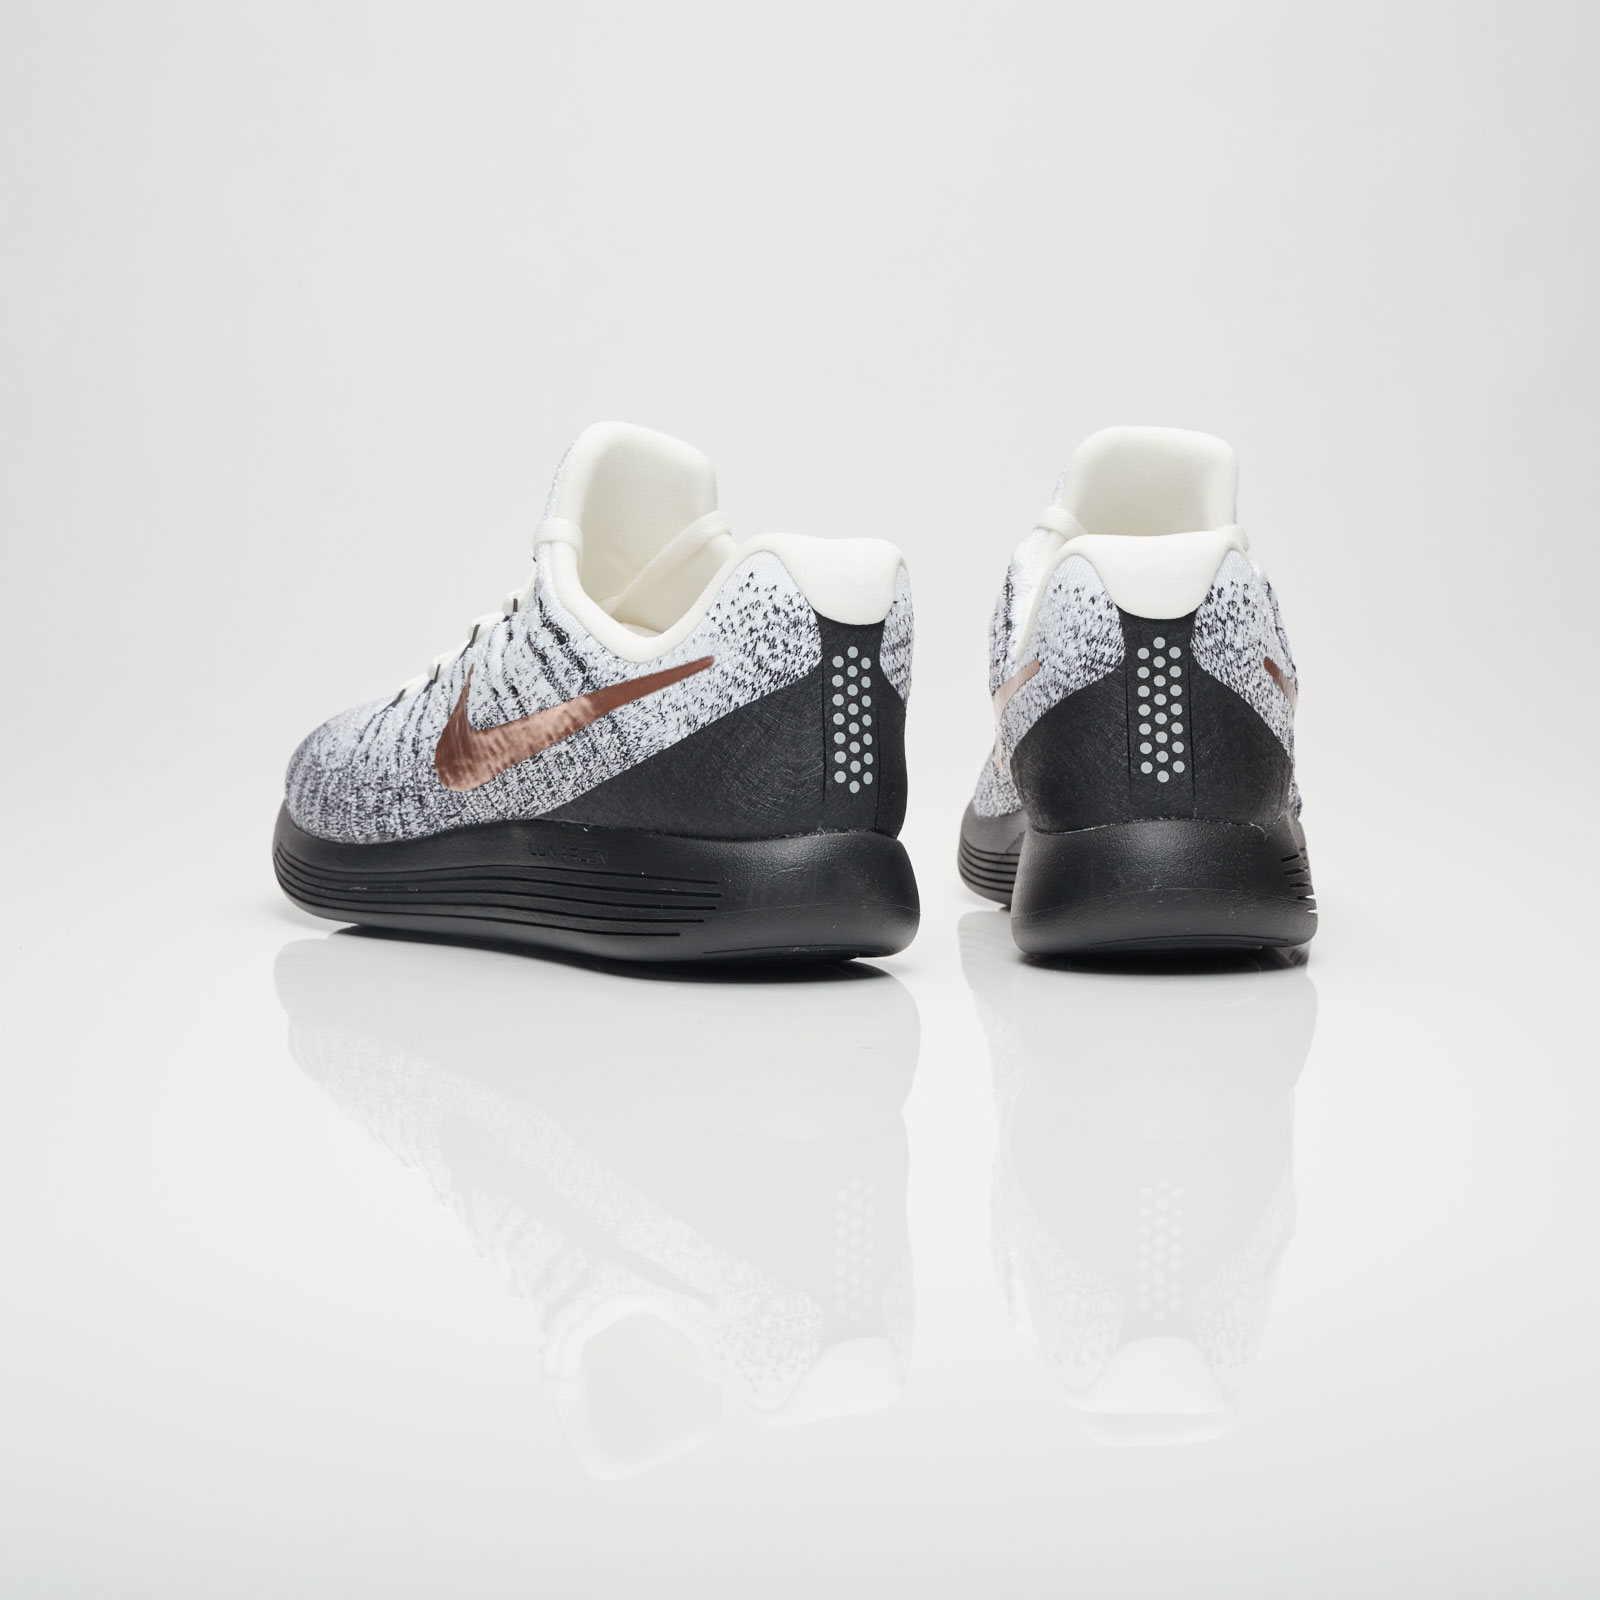 796db67fde707 Nike Lunarepic Low FK 2 X-Plore - 904742-100 - Sneakersnstuff ...